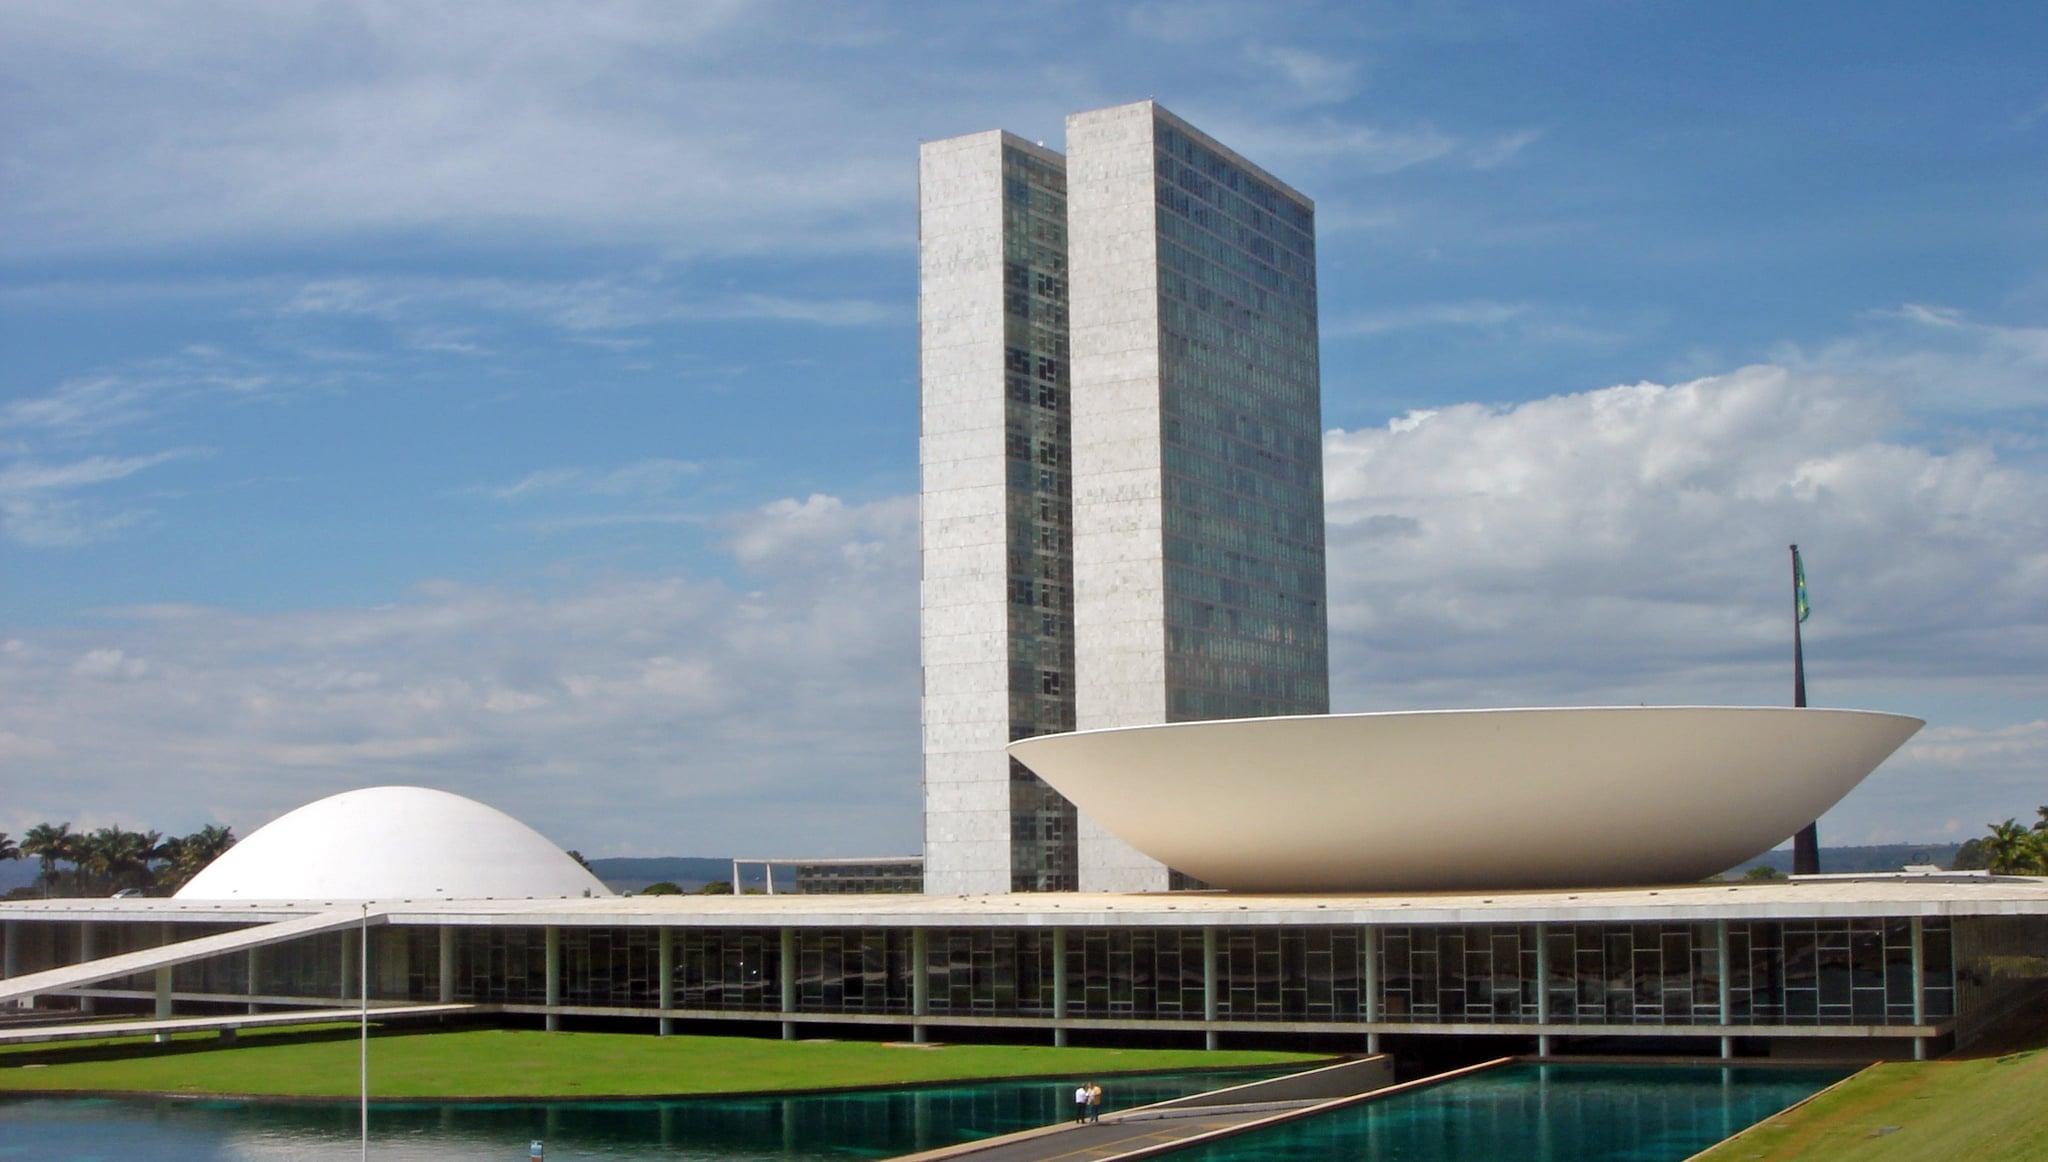 Brazil infra committee approves energy watchdog directors